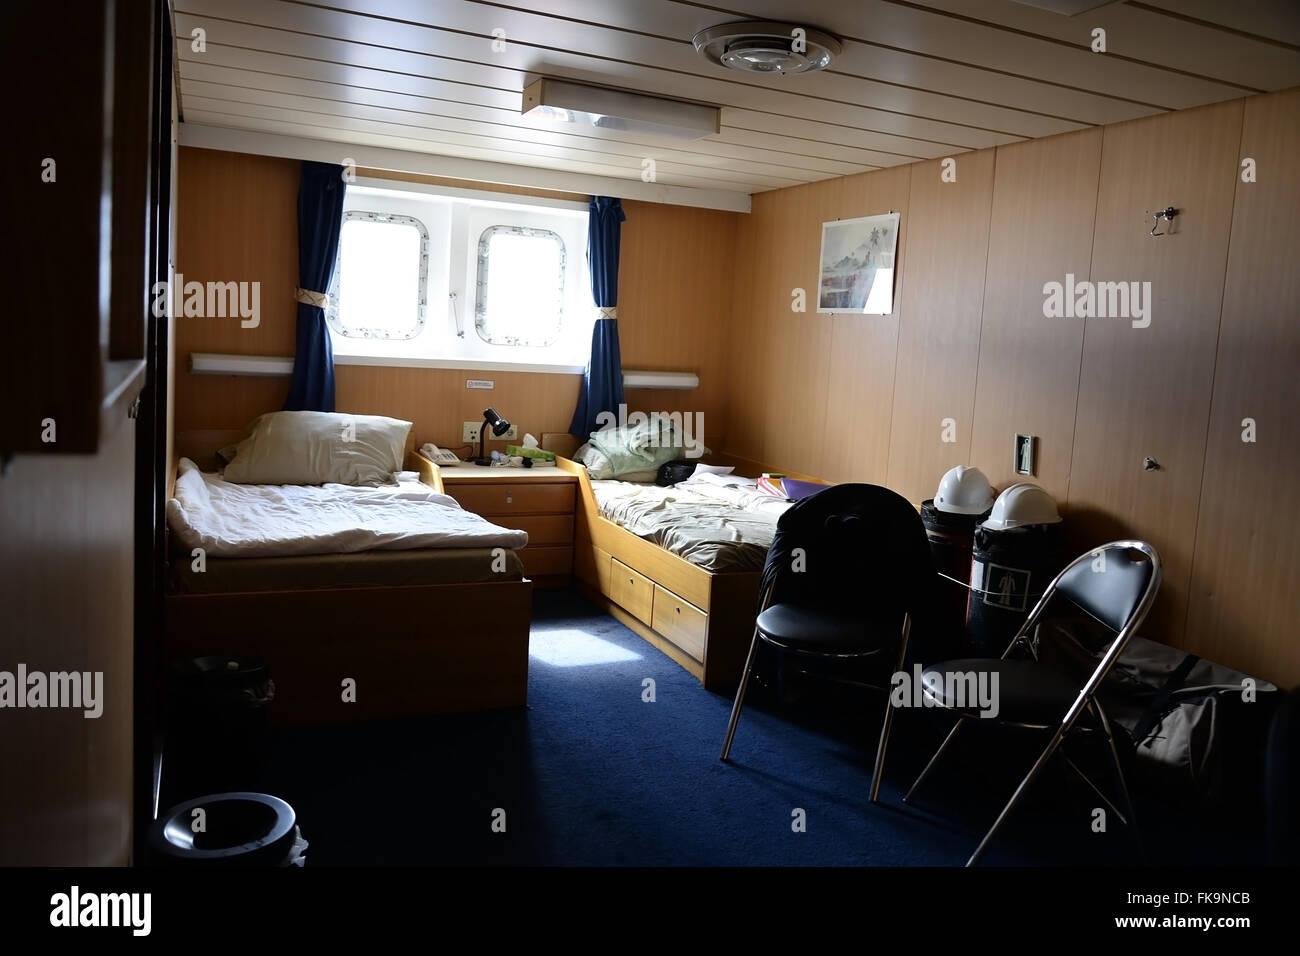 Bunk Beds Cabin Stockfotos & Bunk Beds Cabin Bilder - Alamy